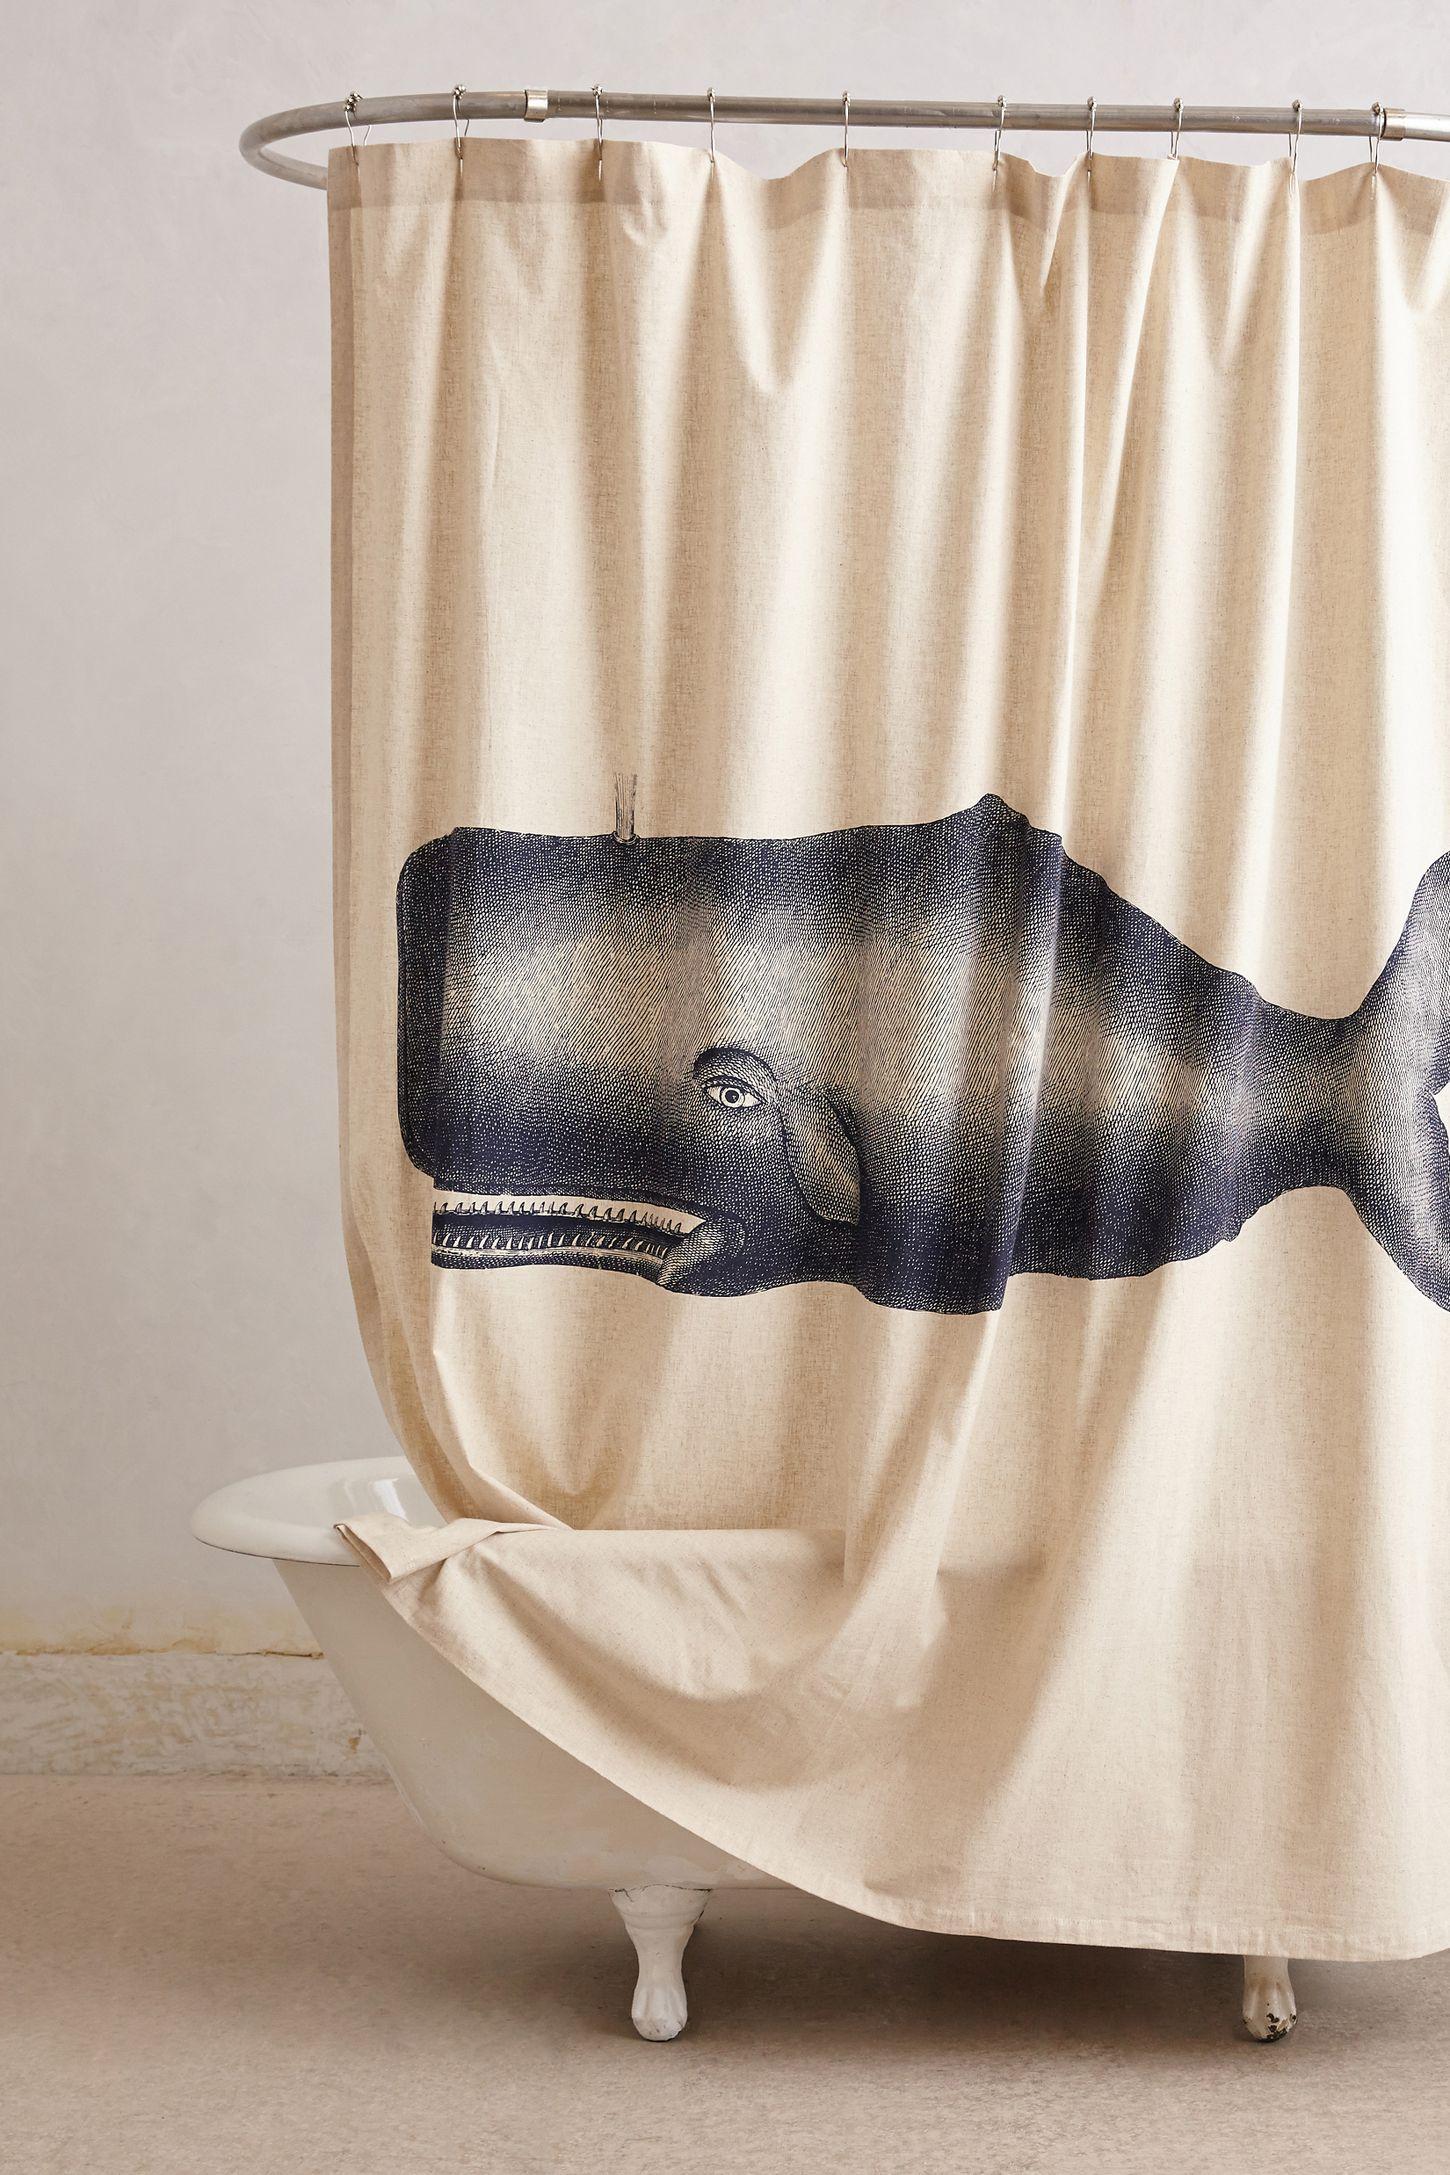 Anthropologie floral shower curtain - Anthropologie Floral Shower Curtain 4